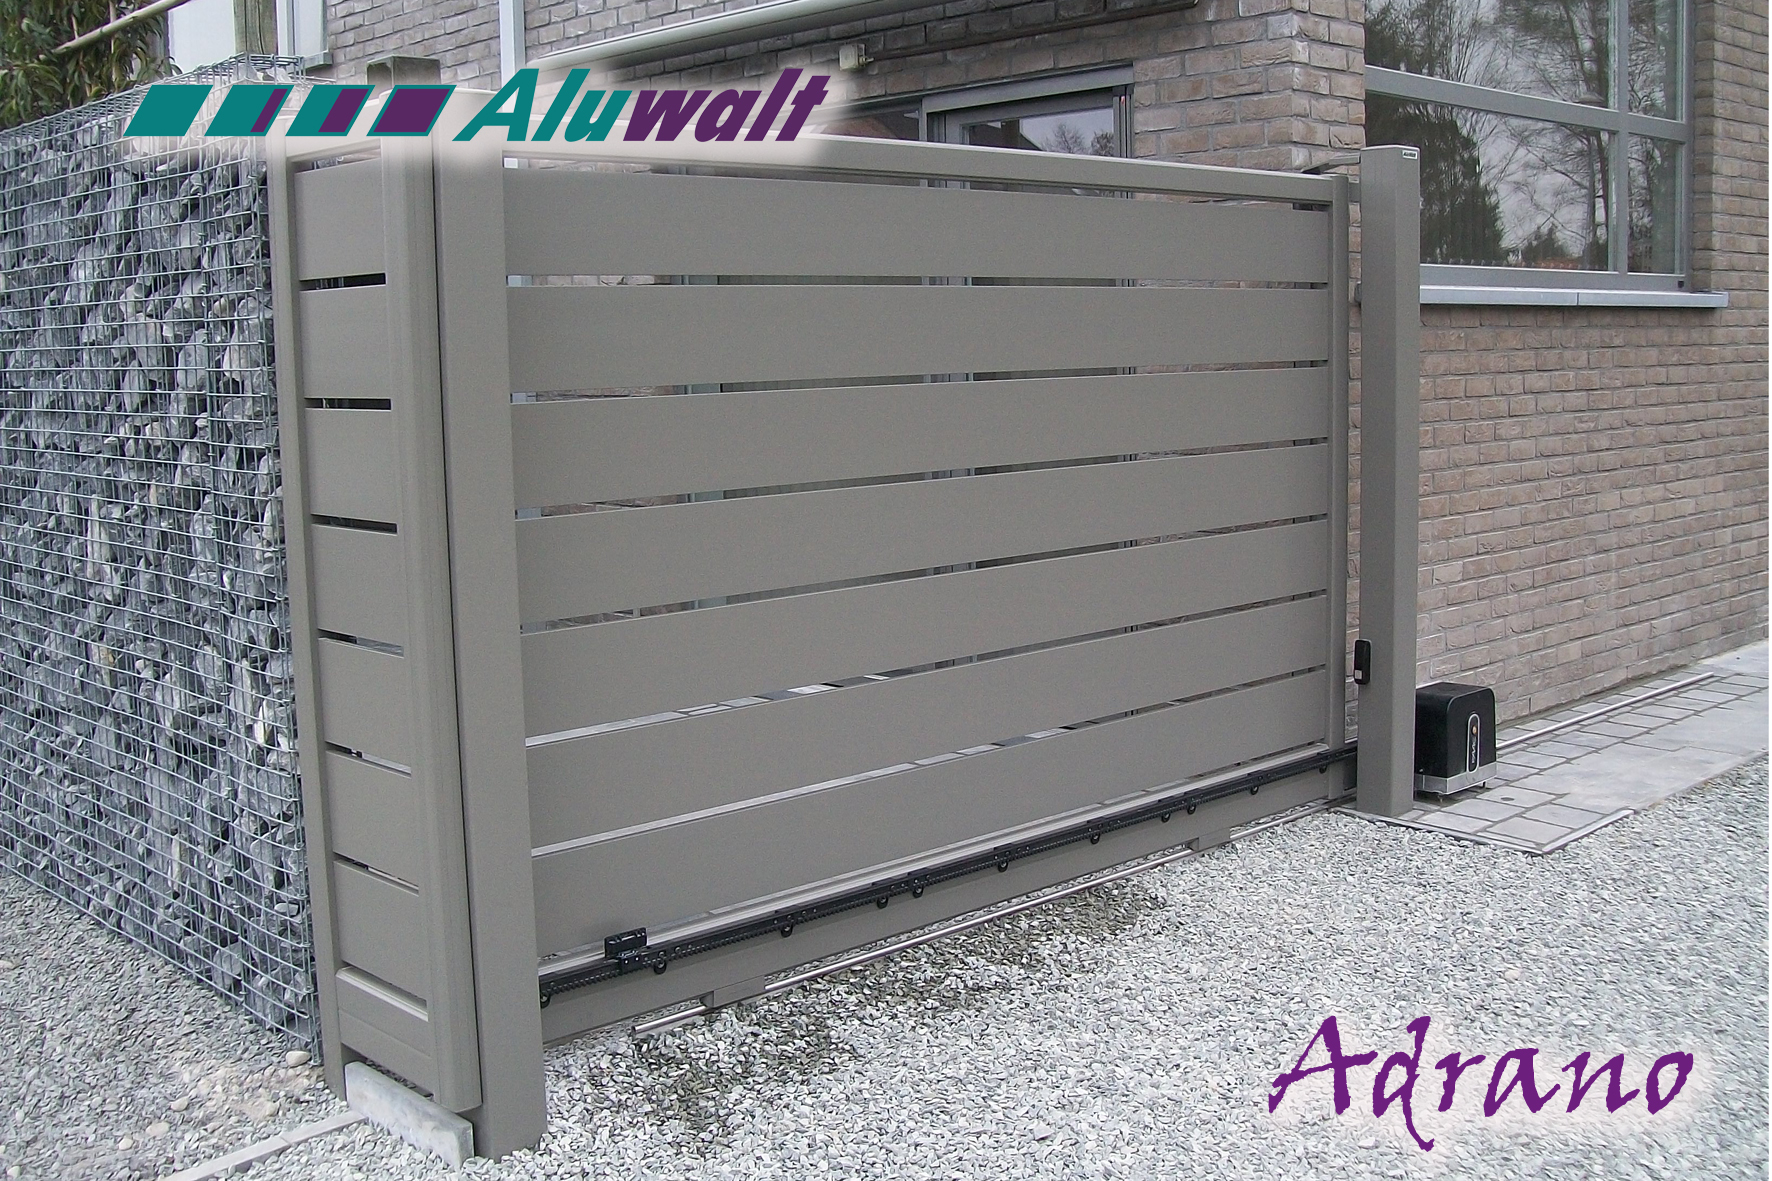 Adrano25